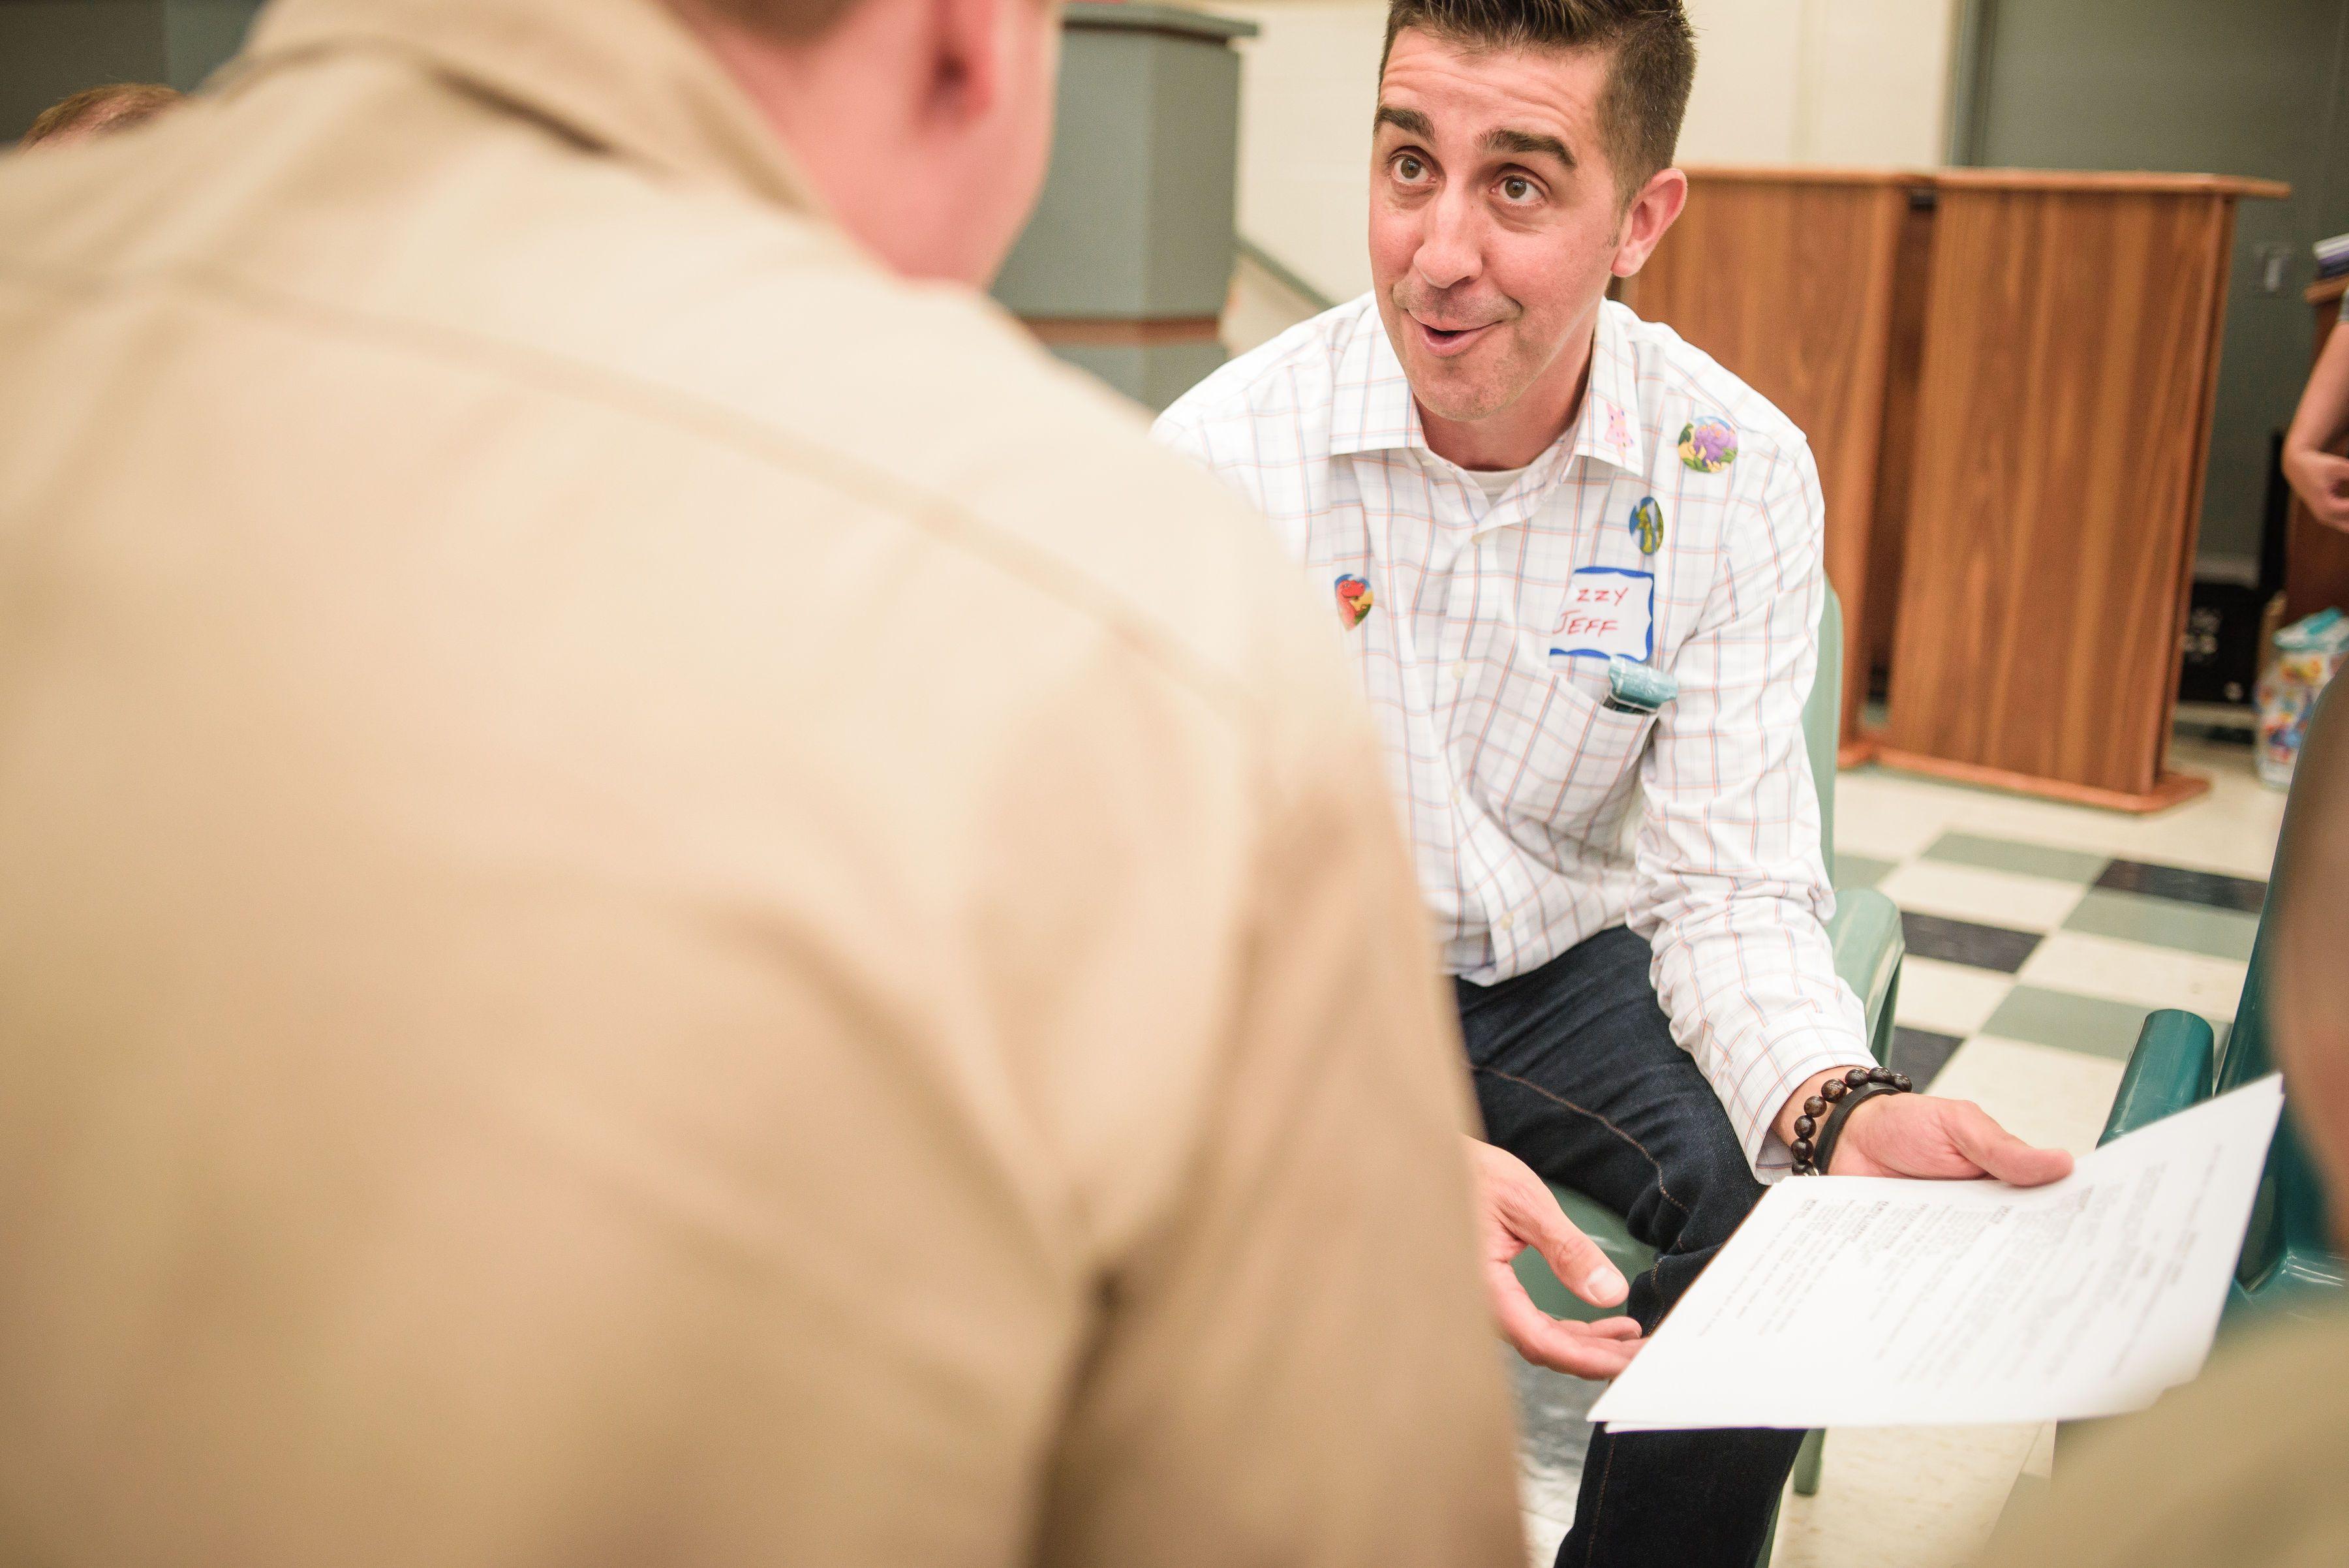 Volunteering Holds Value for our Nebraska Nonprofit